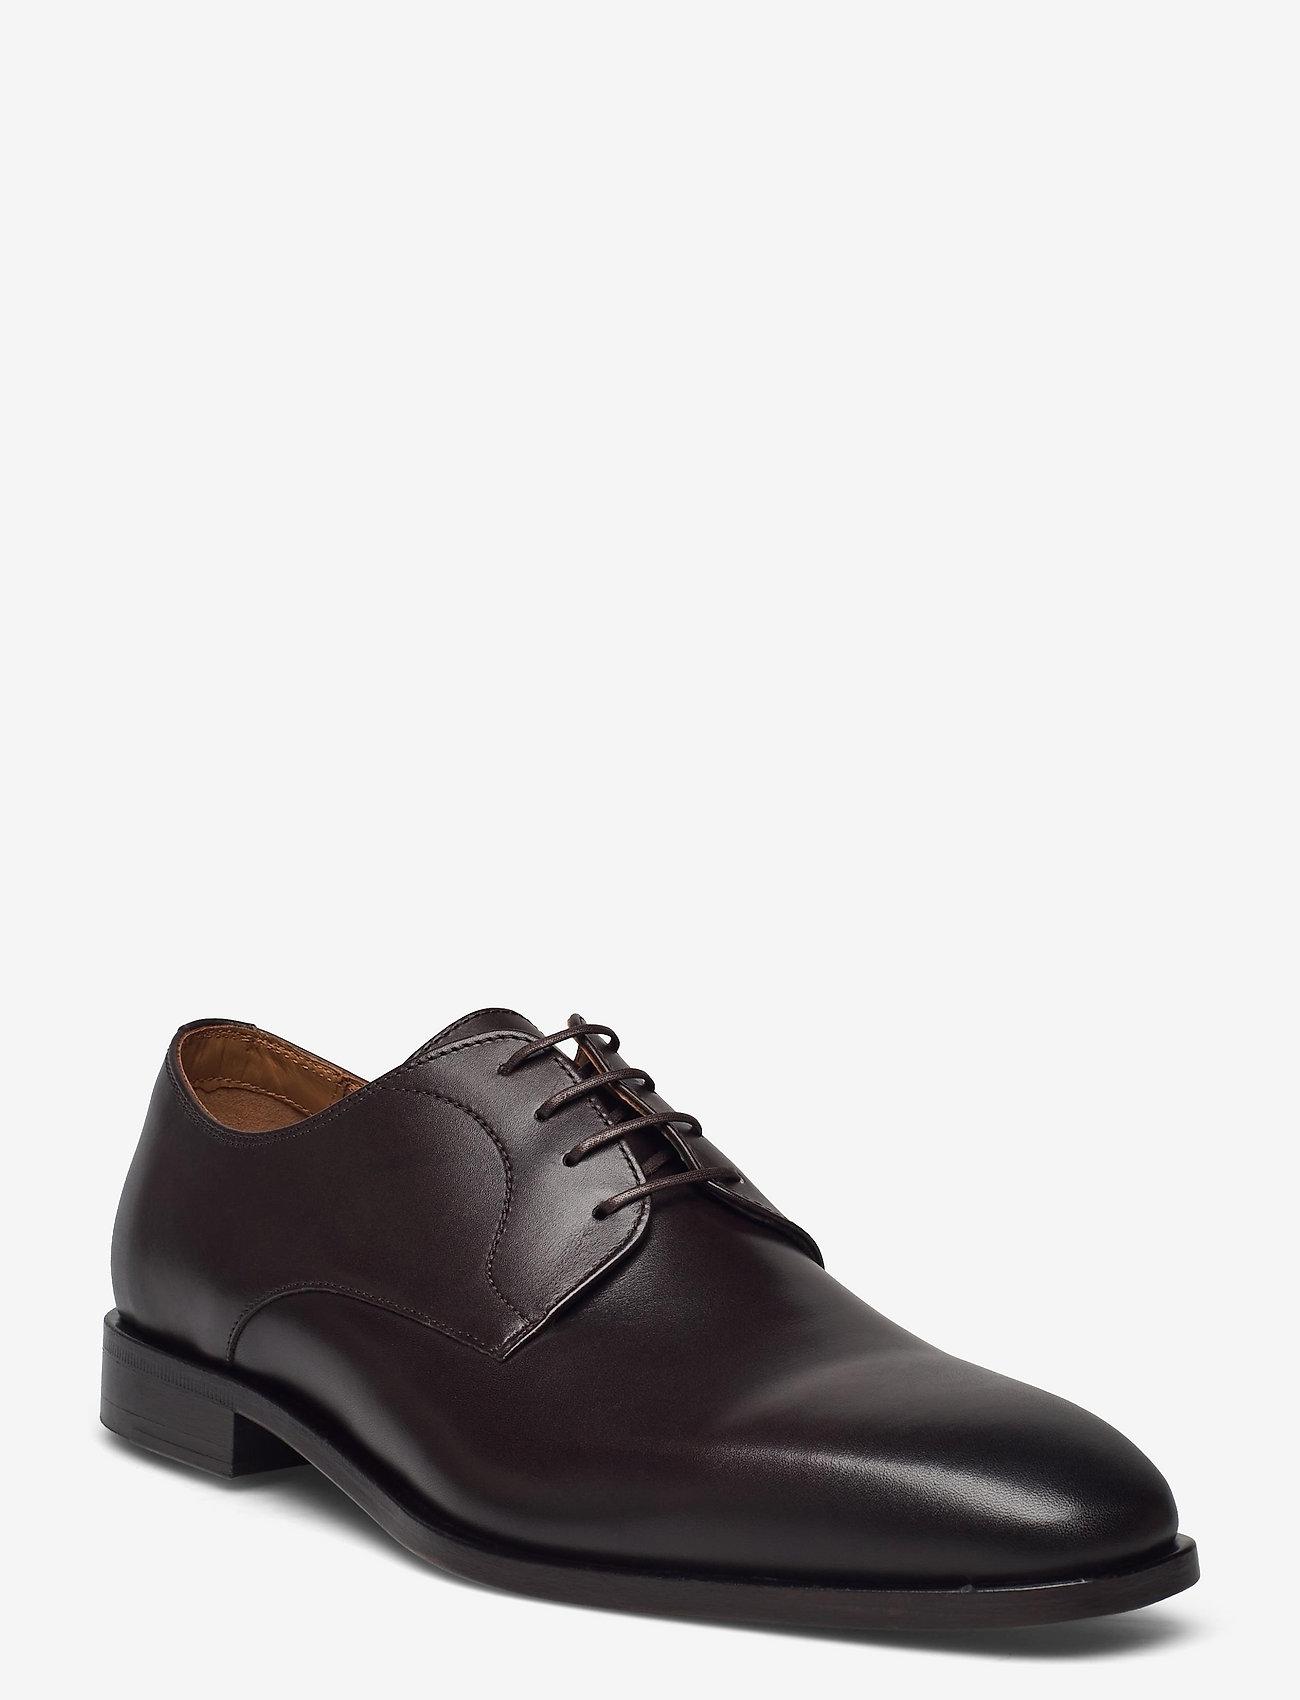 BOSS - Lisbon_Derb_bu1 - chaussures lacées - dark brown - 0